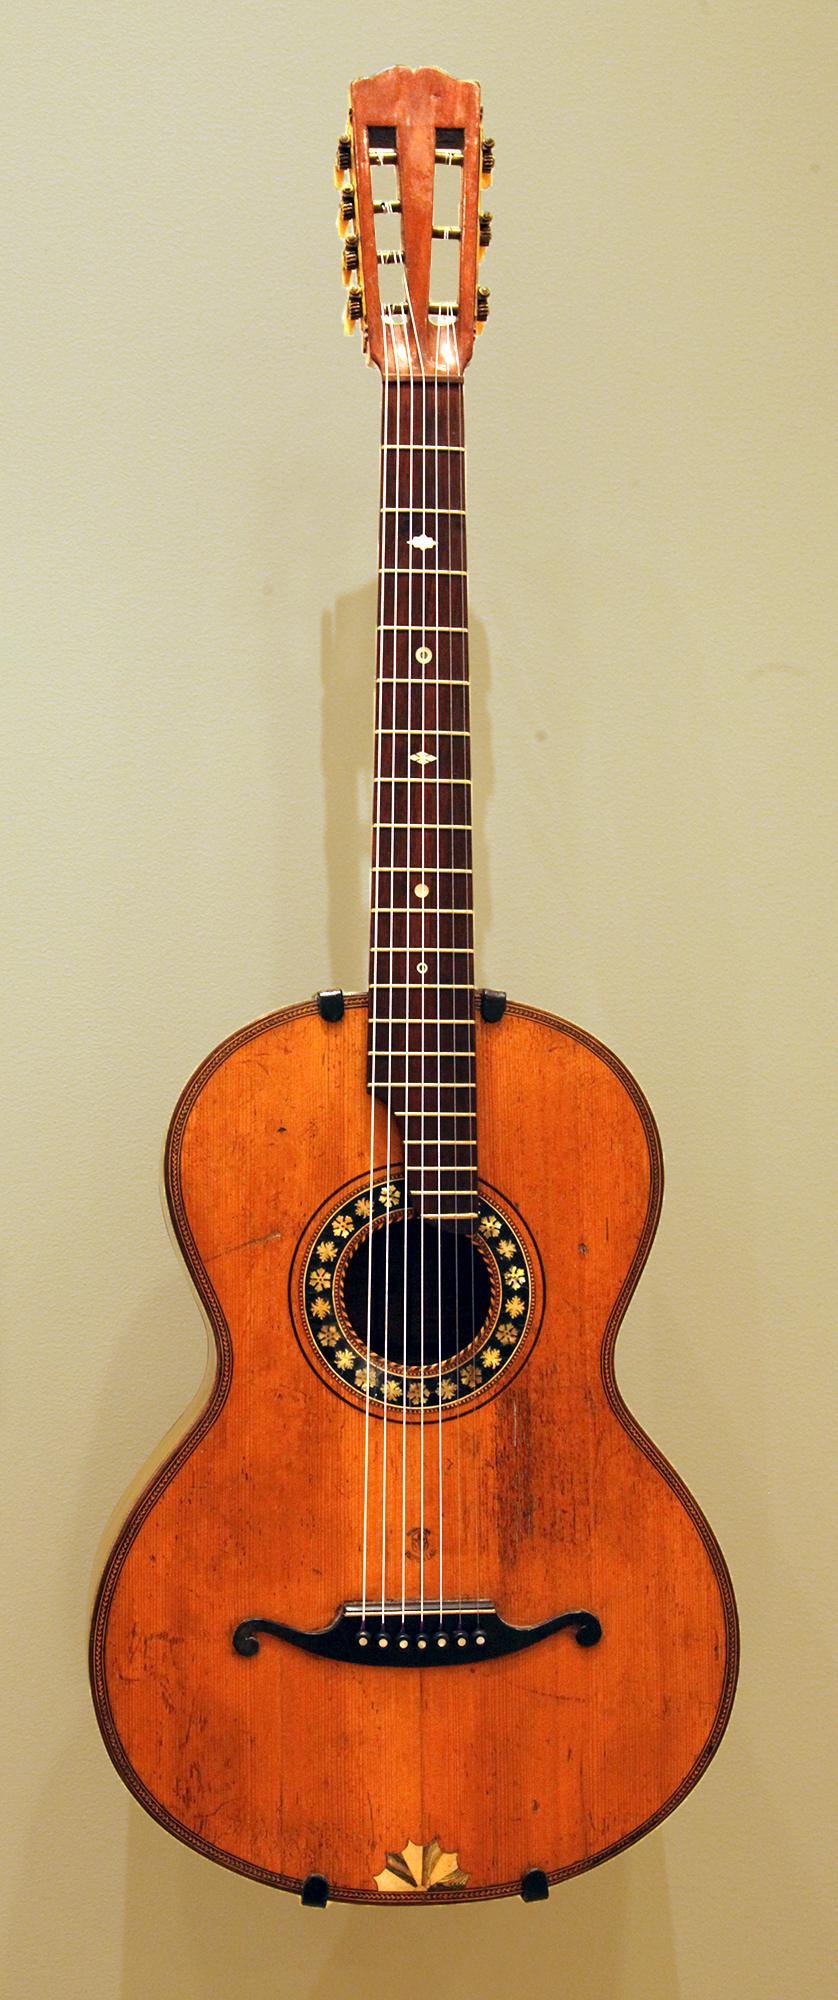 A 7 guitar